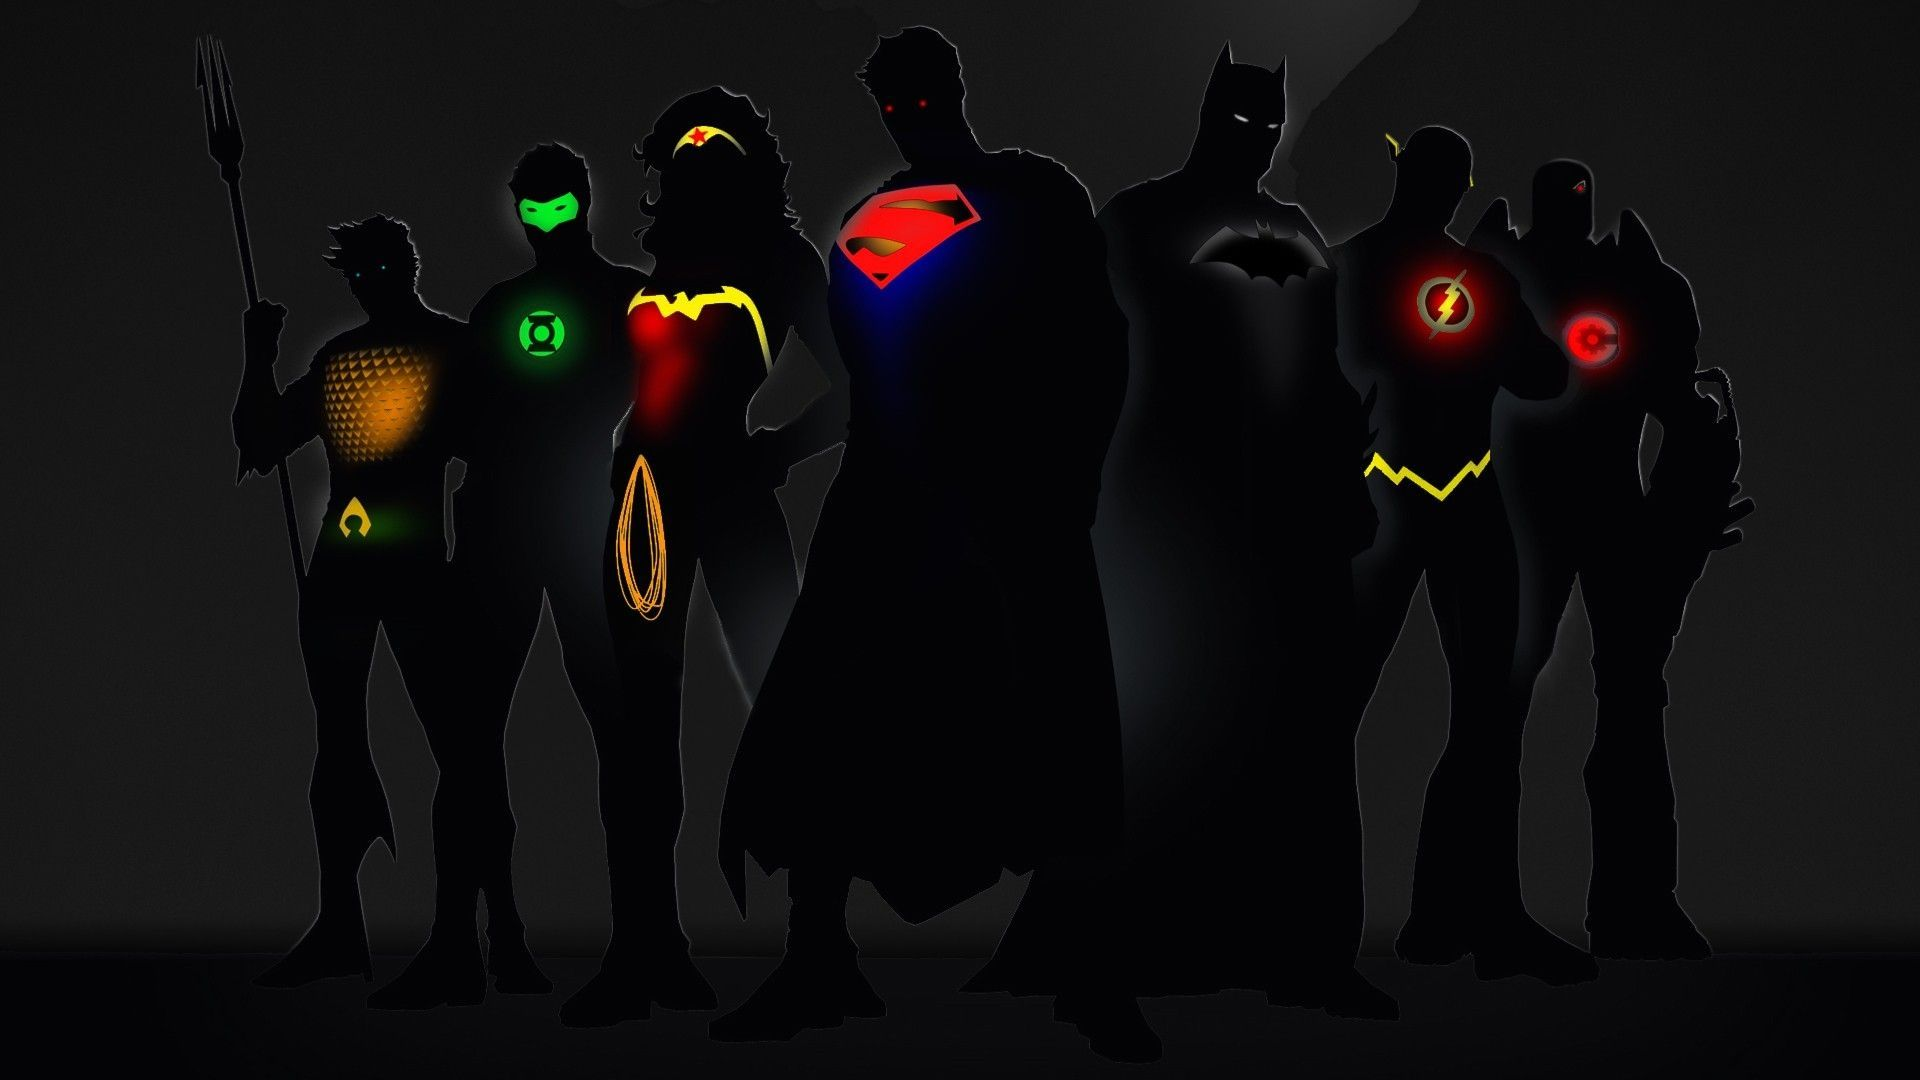 Cool Superhero Wallpapers - Top Free Cool Superhero Backgrounds - WallpaperAccess